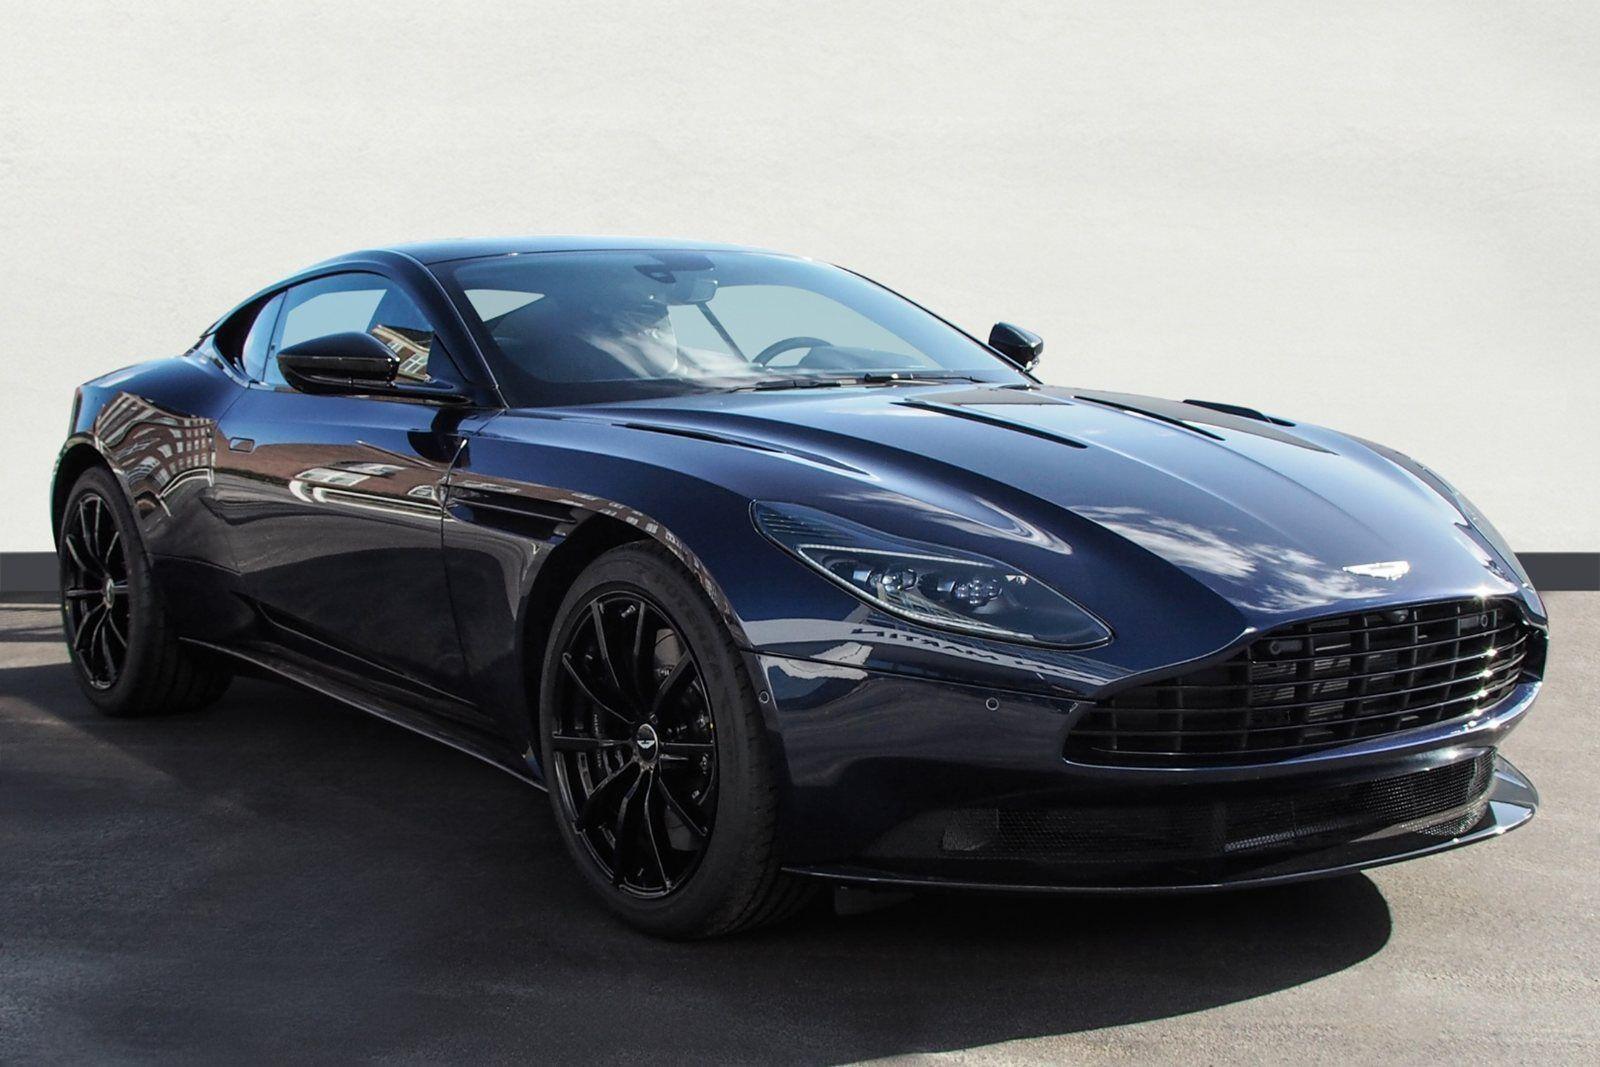 Aston Martin DB11 5,2 V12 Coupé AMR aut. 2d